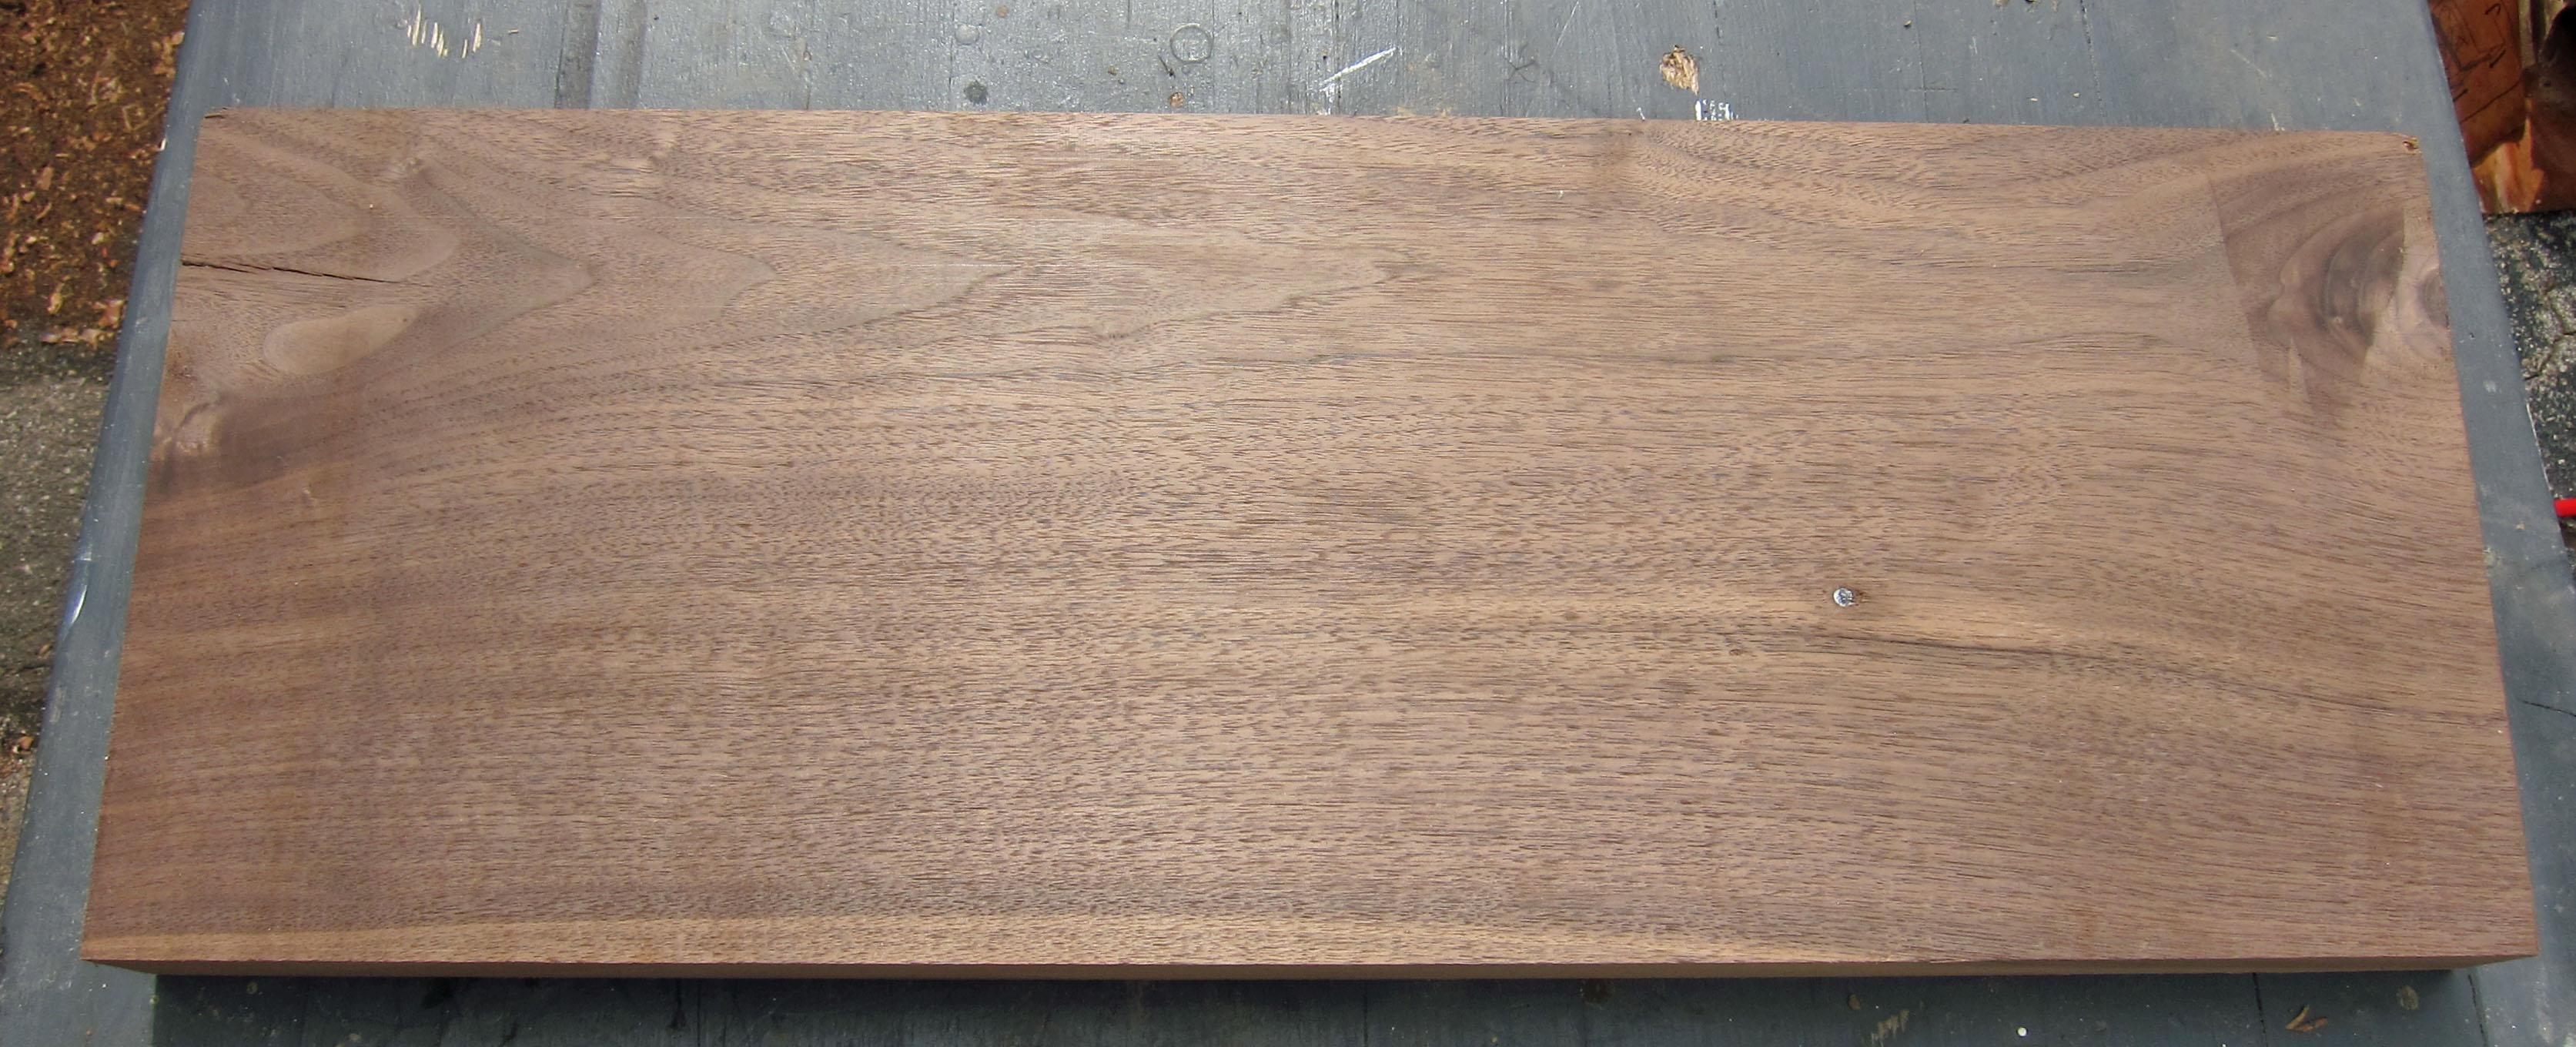 1 Walnut Plank.jpg